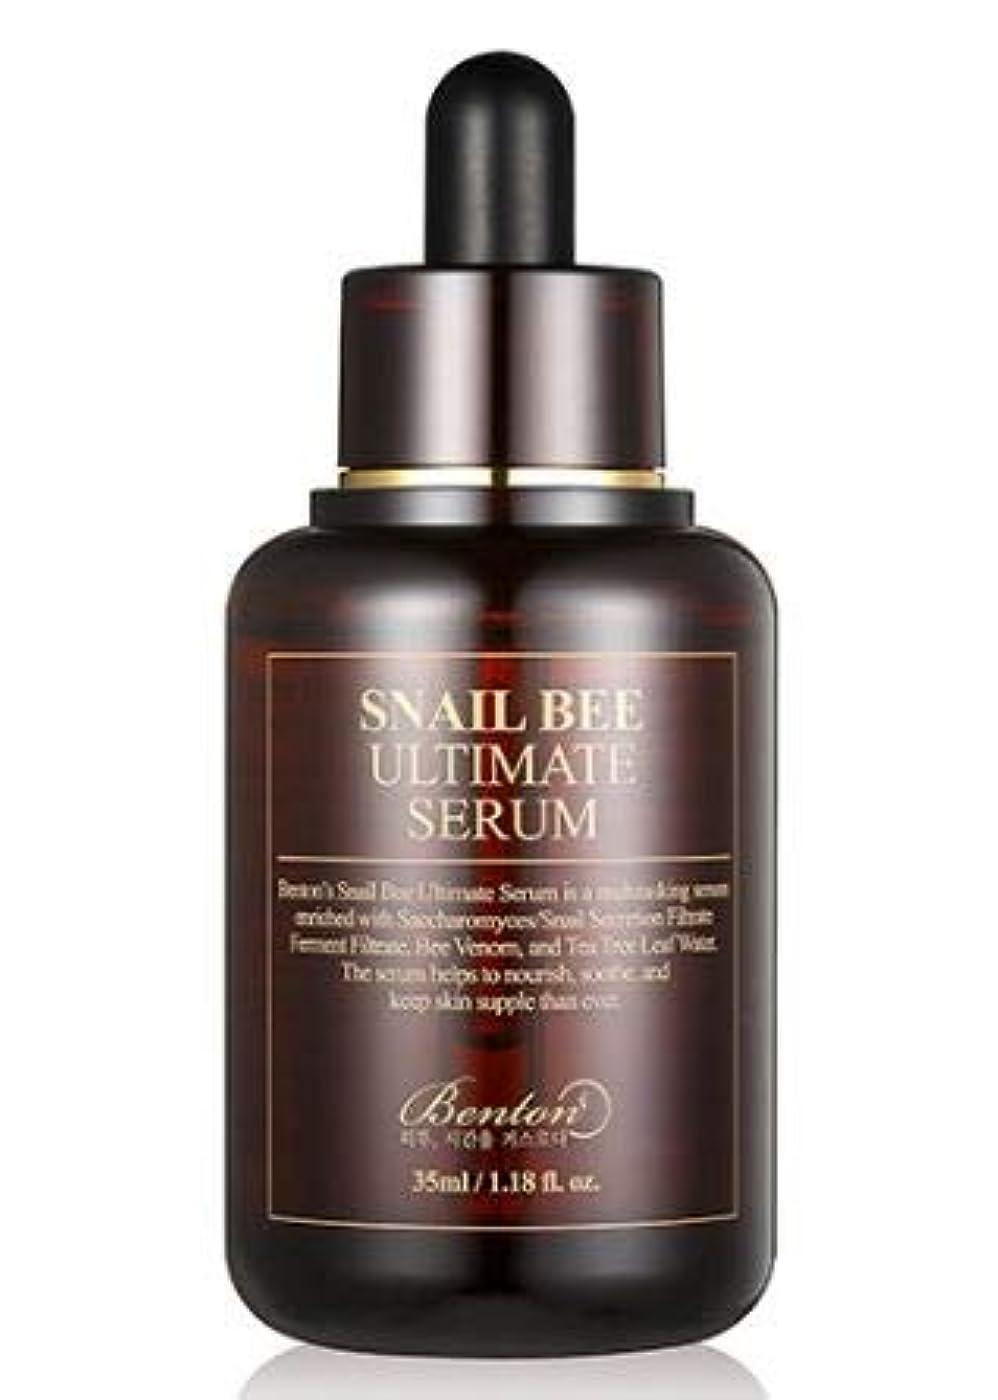 [Benton] Snail Bee Ultimate Serum 35ml / [ベントン] スネイル BEE アルティメット セラム 35ml [並行輸入品]